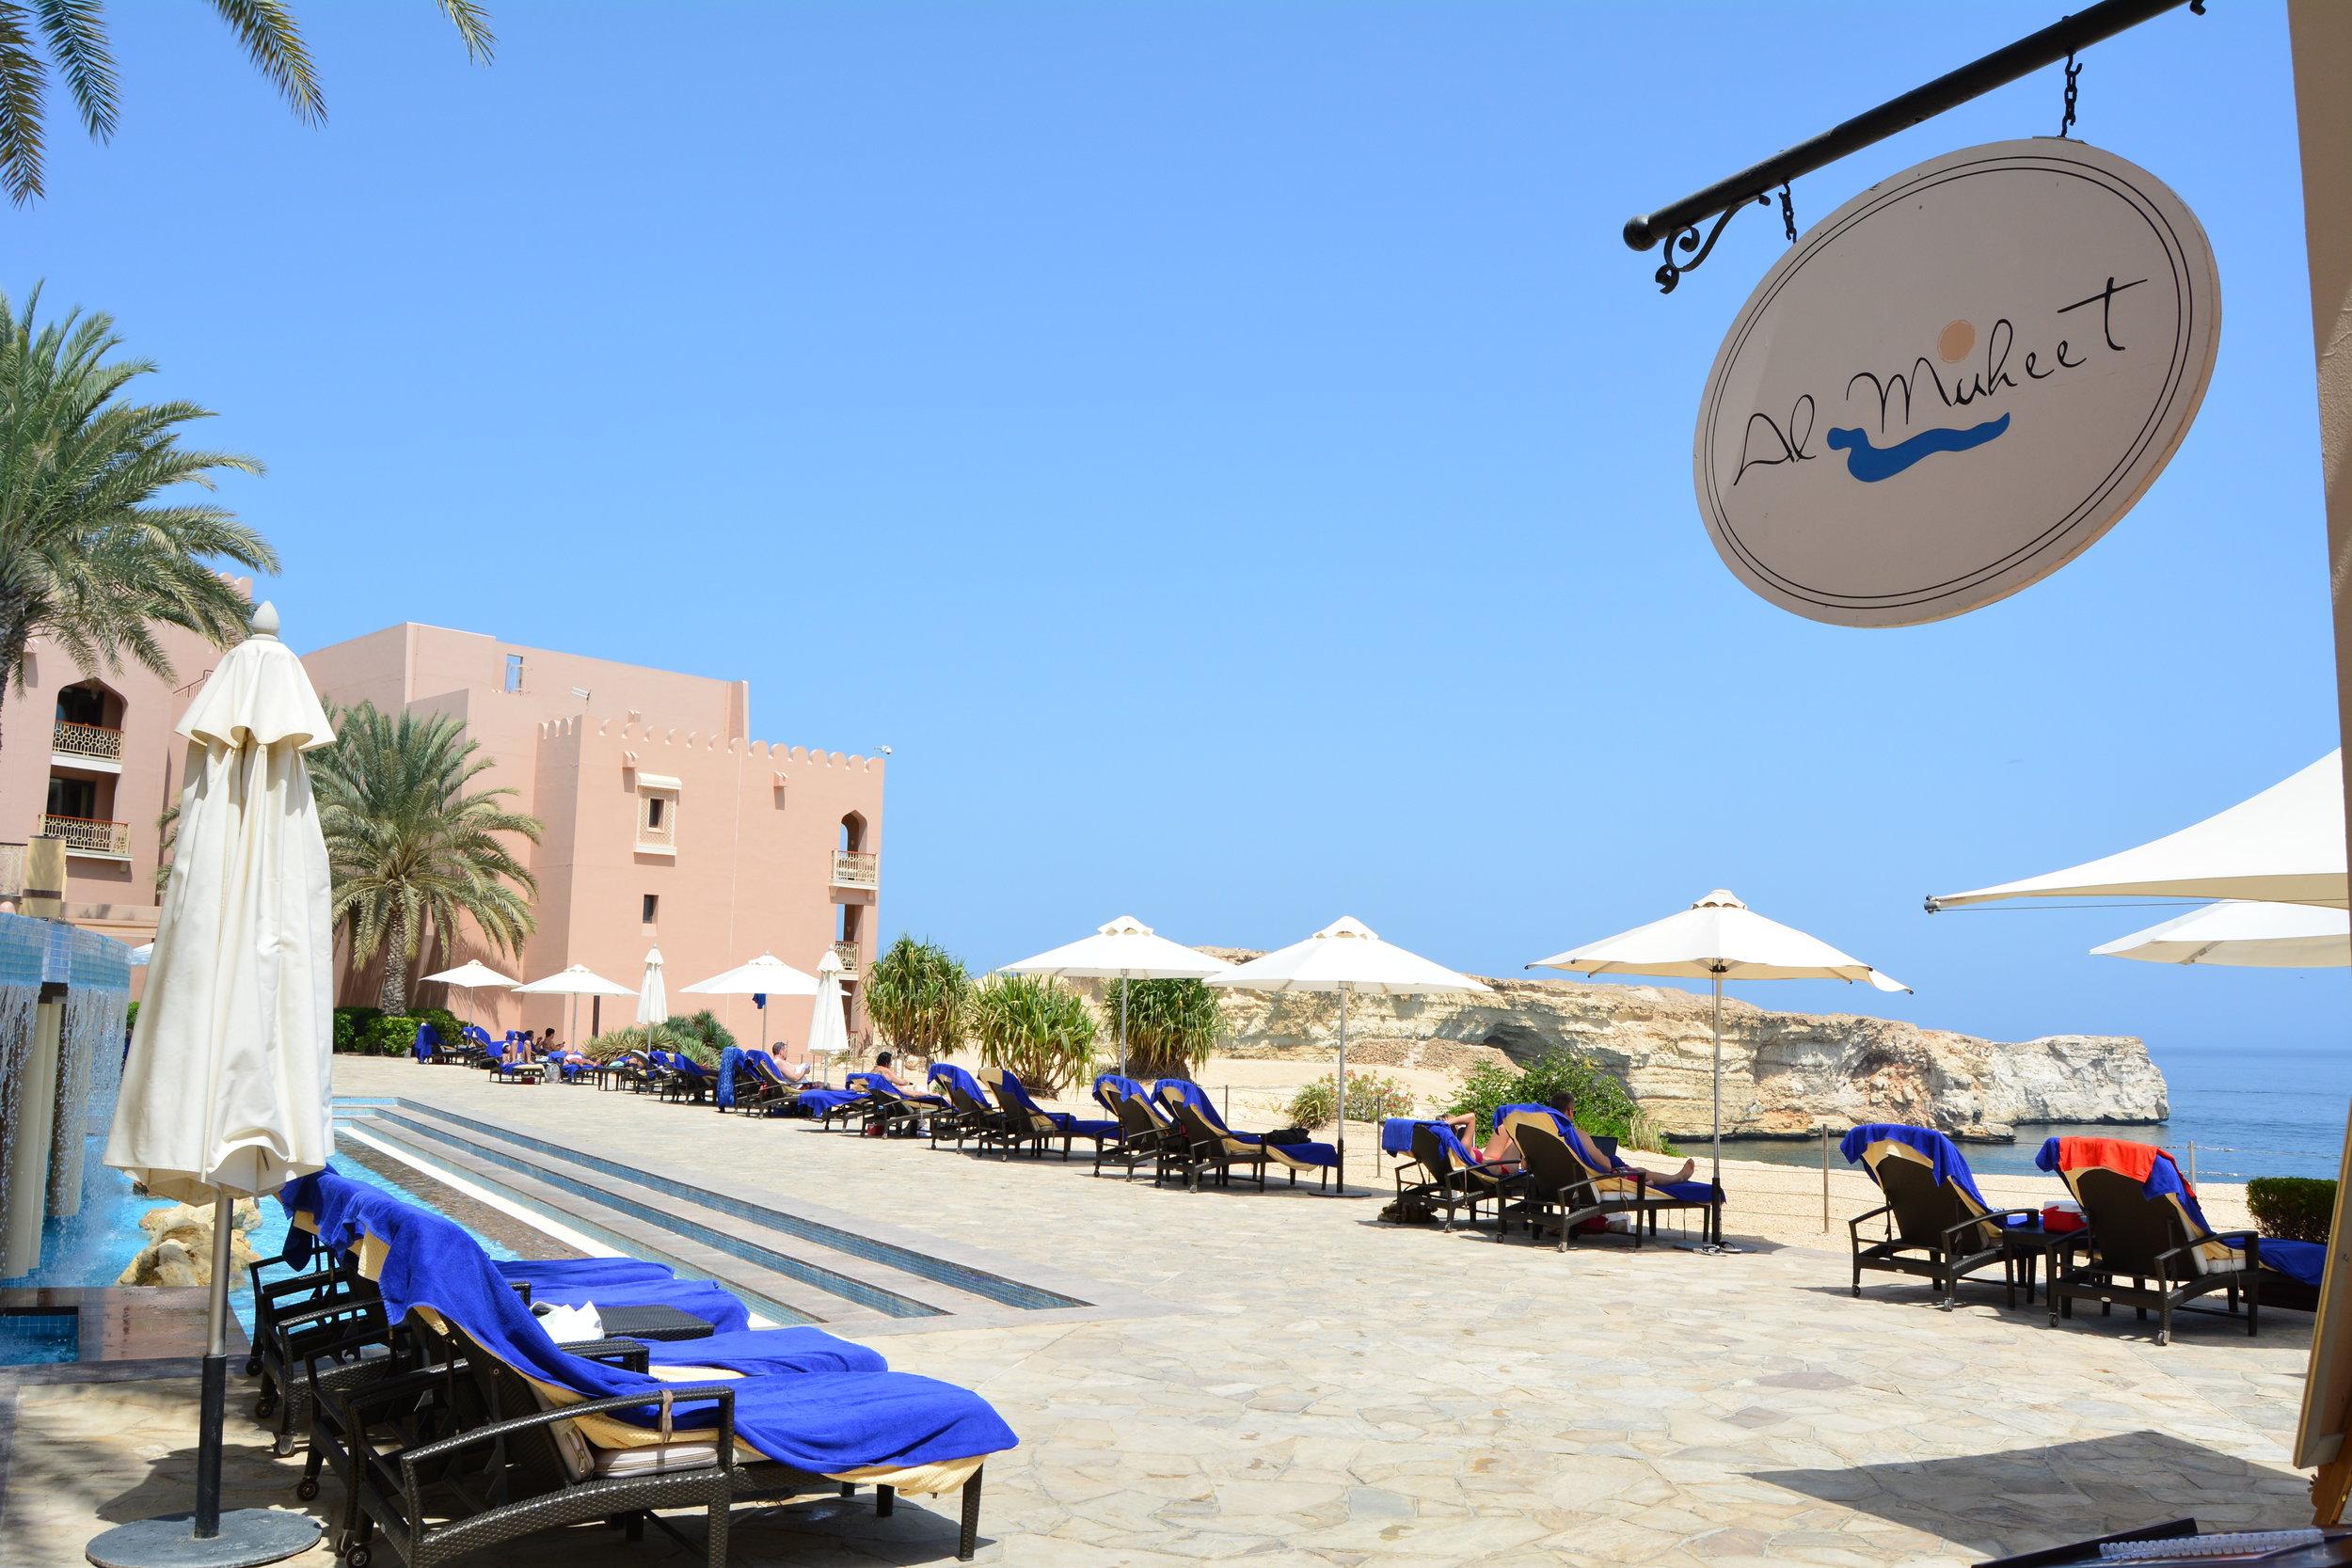 Al Muheet (Shangri-La Muscat)